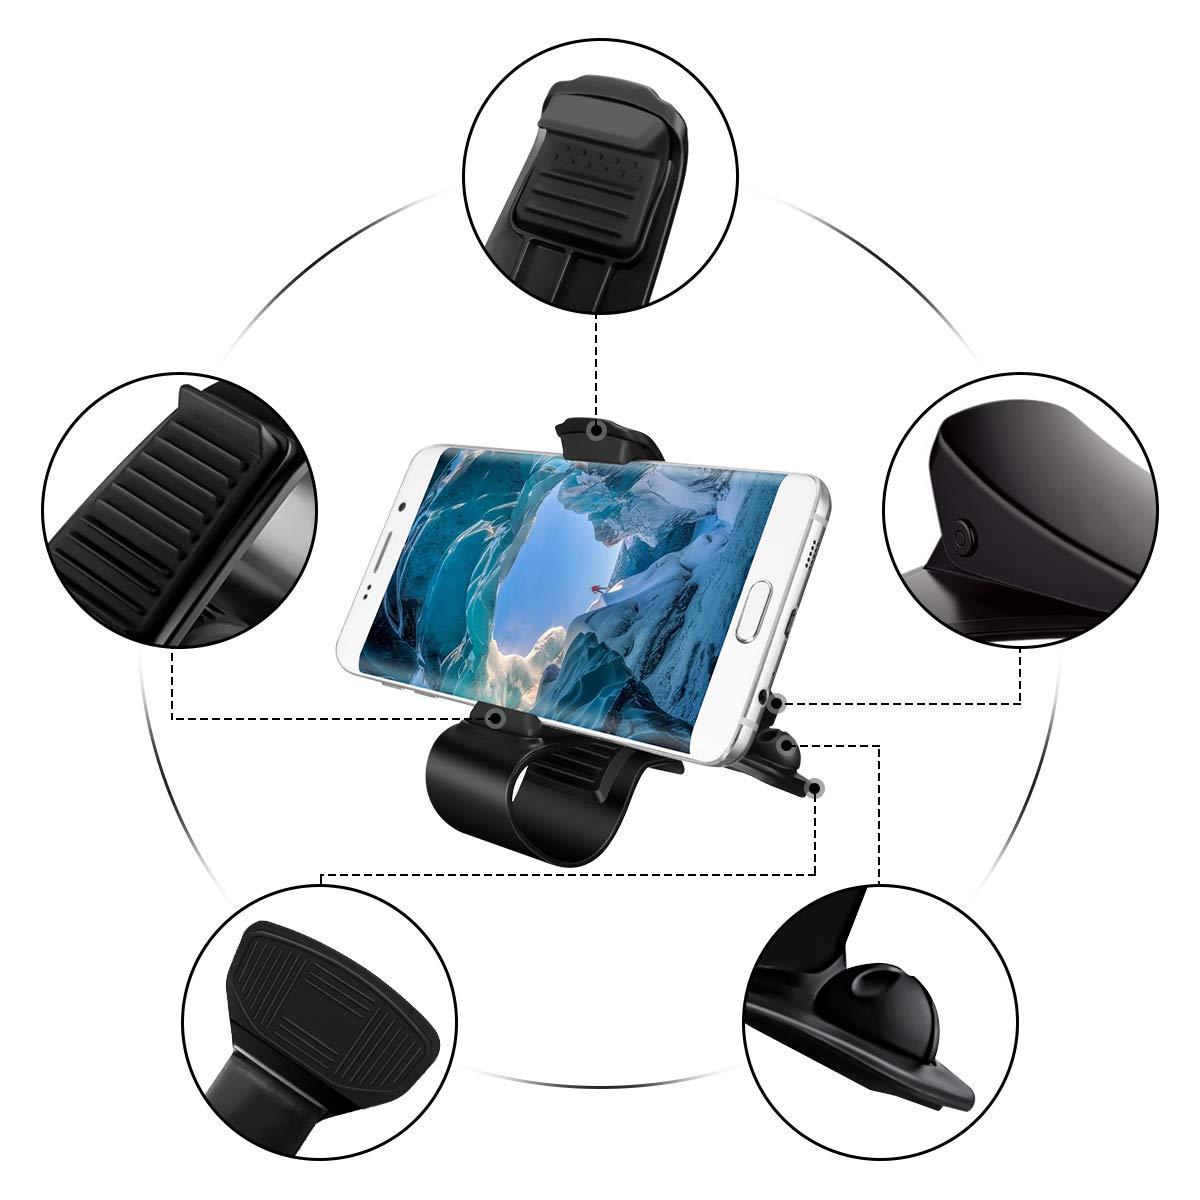 M.Way Soporte para Teléfono de Coche, HUD Base Titular de Teléfono Móvil Compatible iPhone 6/7/8 Plus Andriod galaxia S7 HuaWei con Todo Tipo de ...